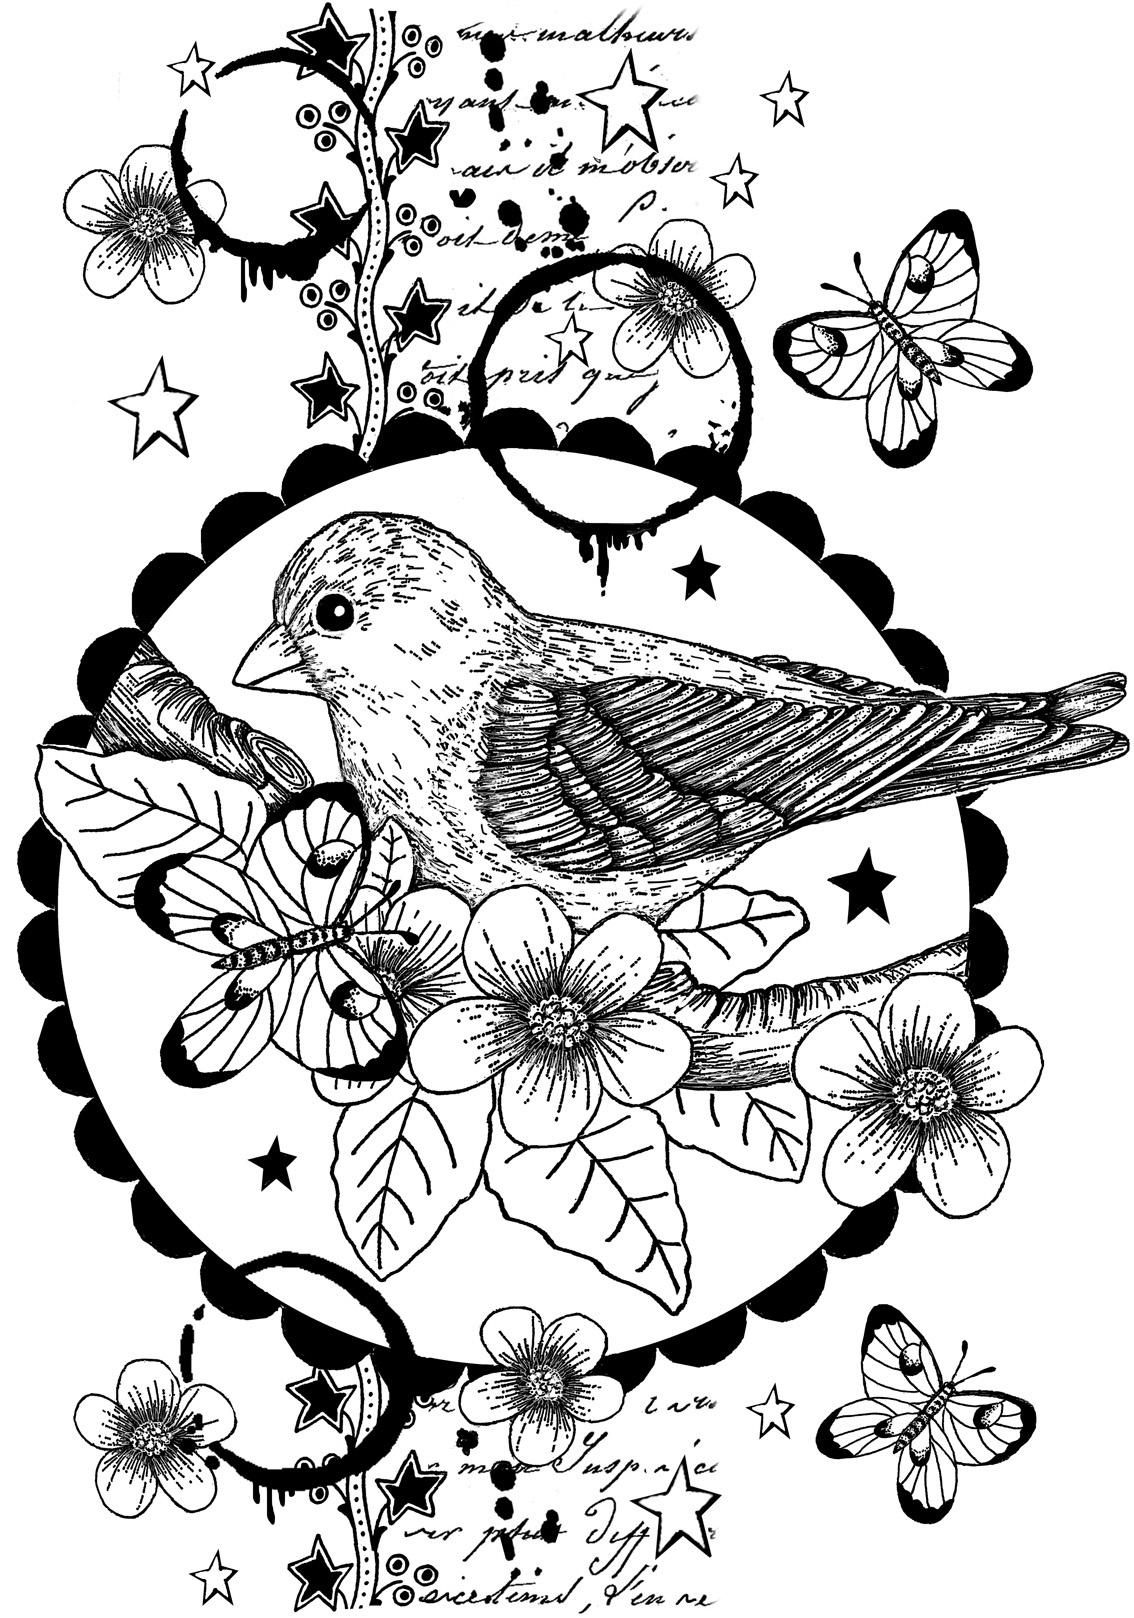 Crafty Individuals Unmounted Rubber Stamp 3.77X5.39-Nesting Instinct